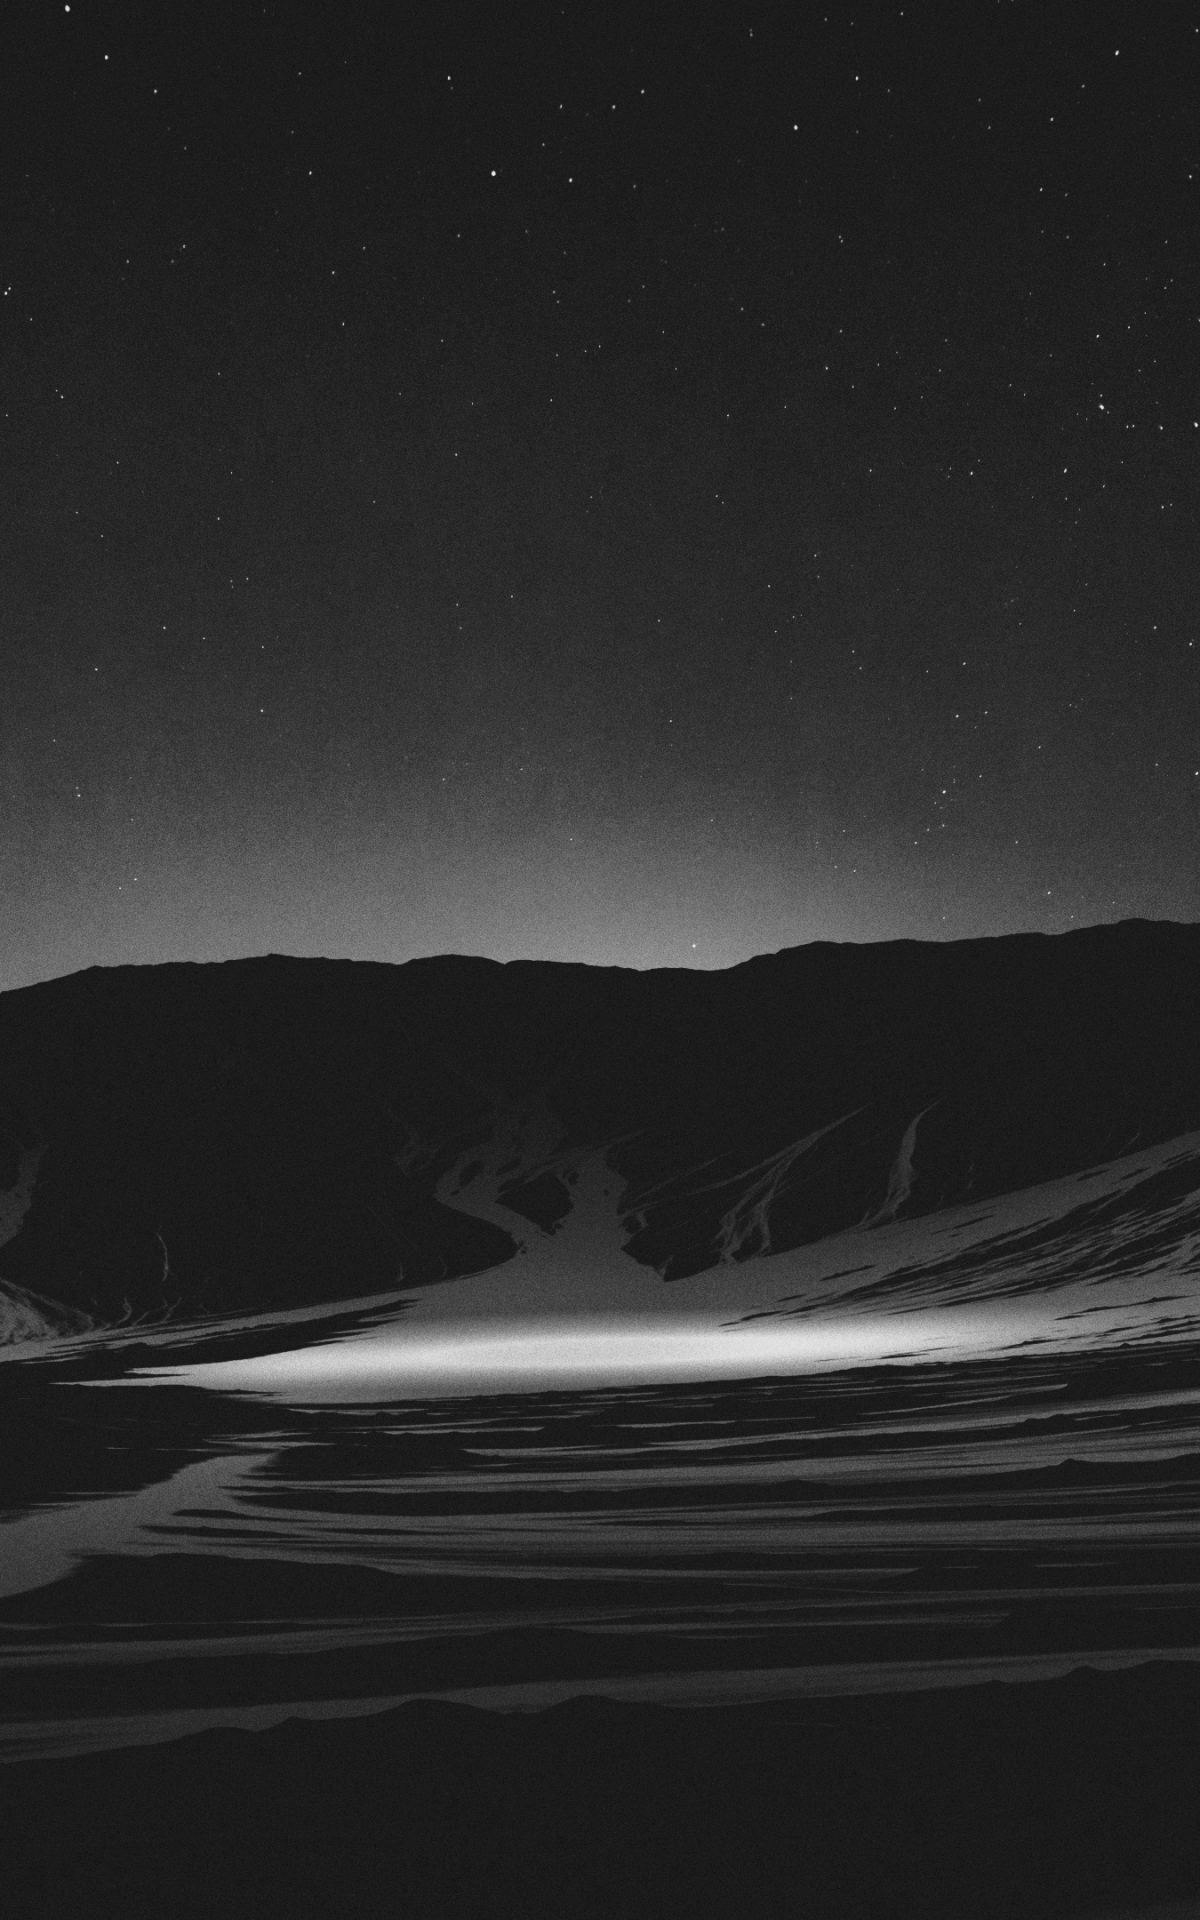 Earth / Night (1200x1920) Mobile Wallpaper